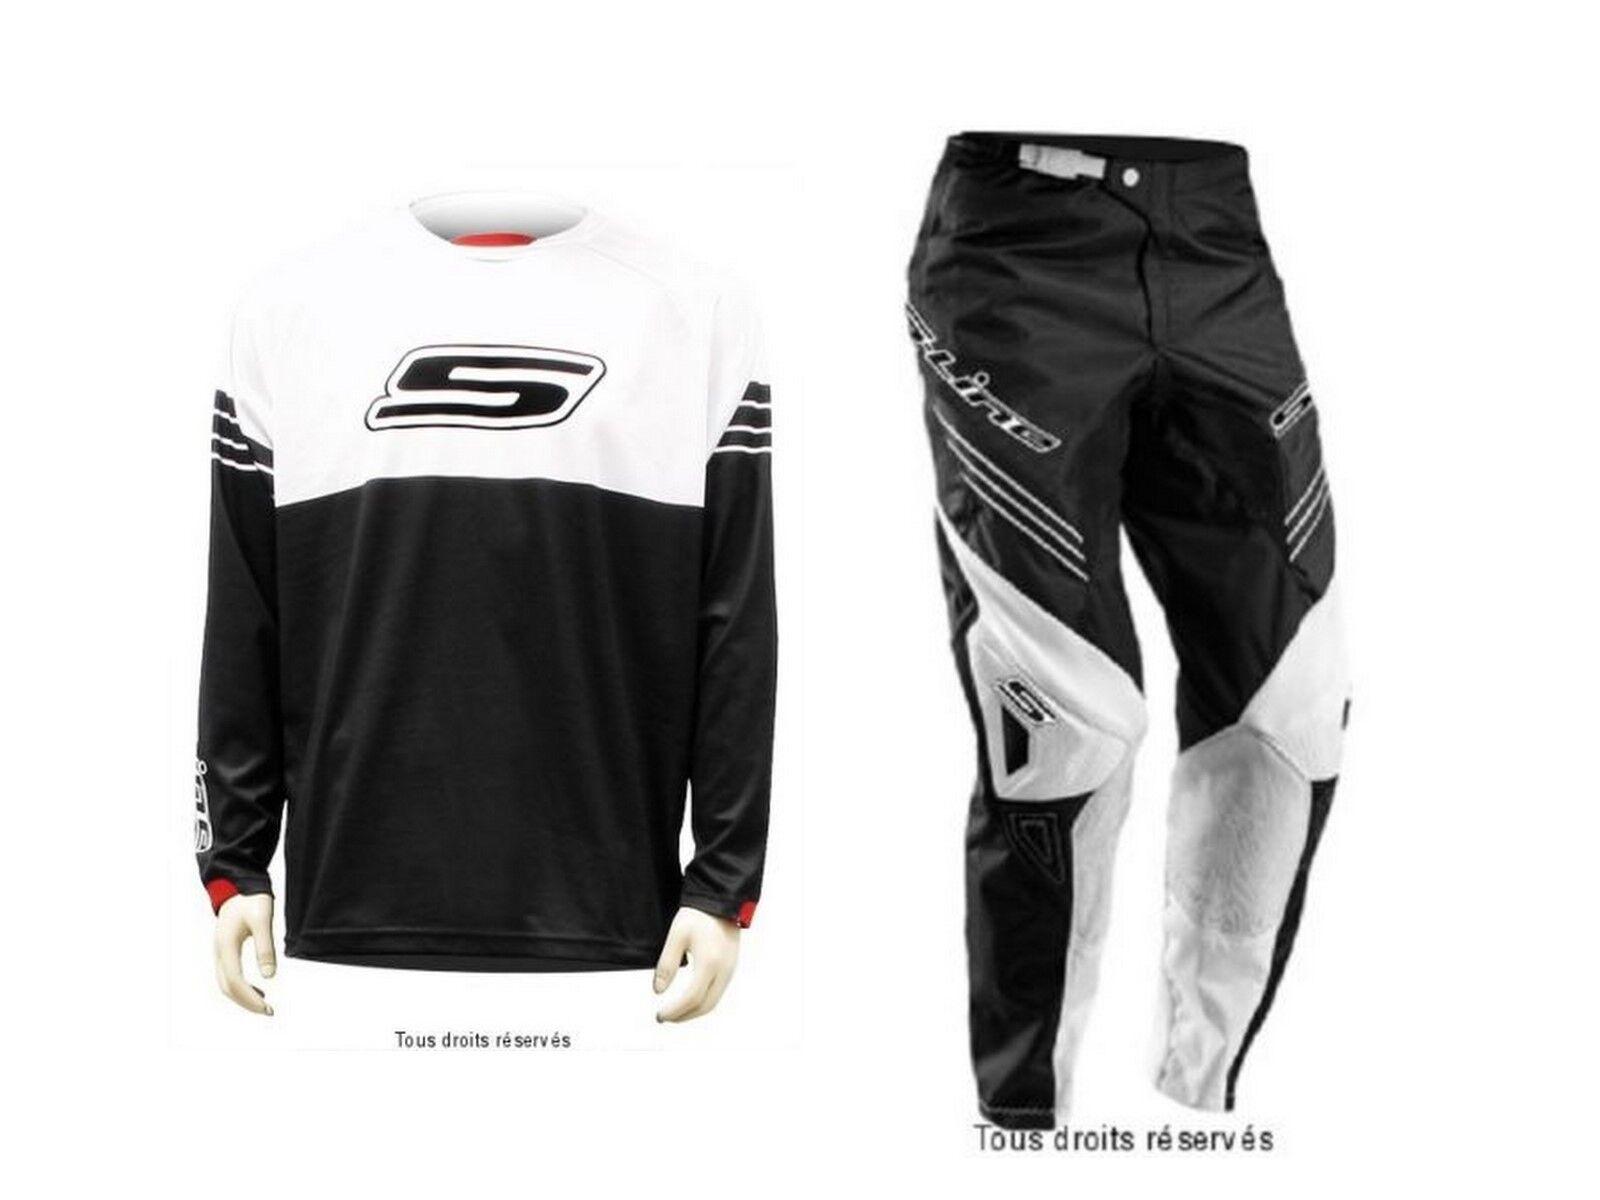 Tenue motocross S-Line Weiß   schwarz pantalon Größe 42 FR   Maillot XL